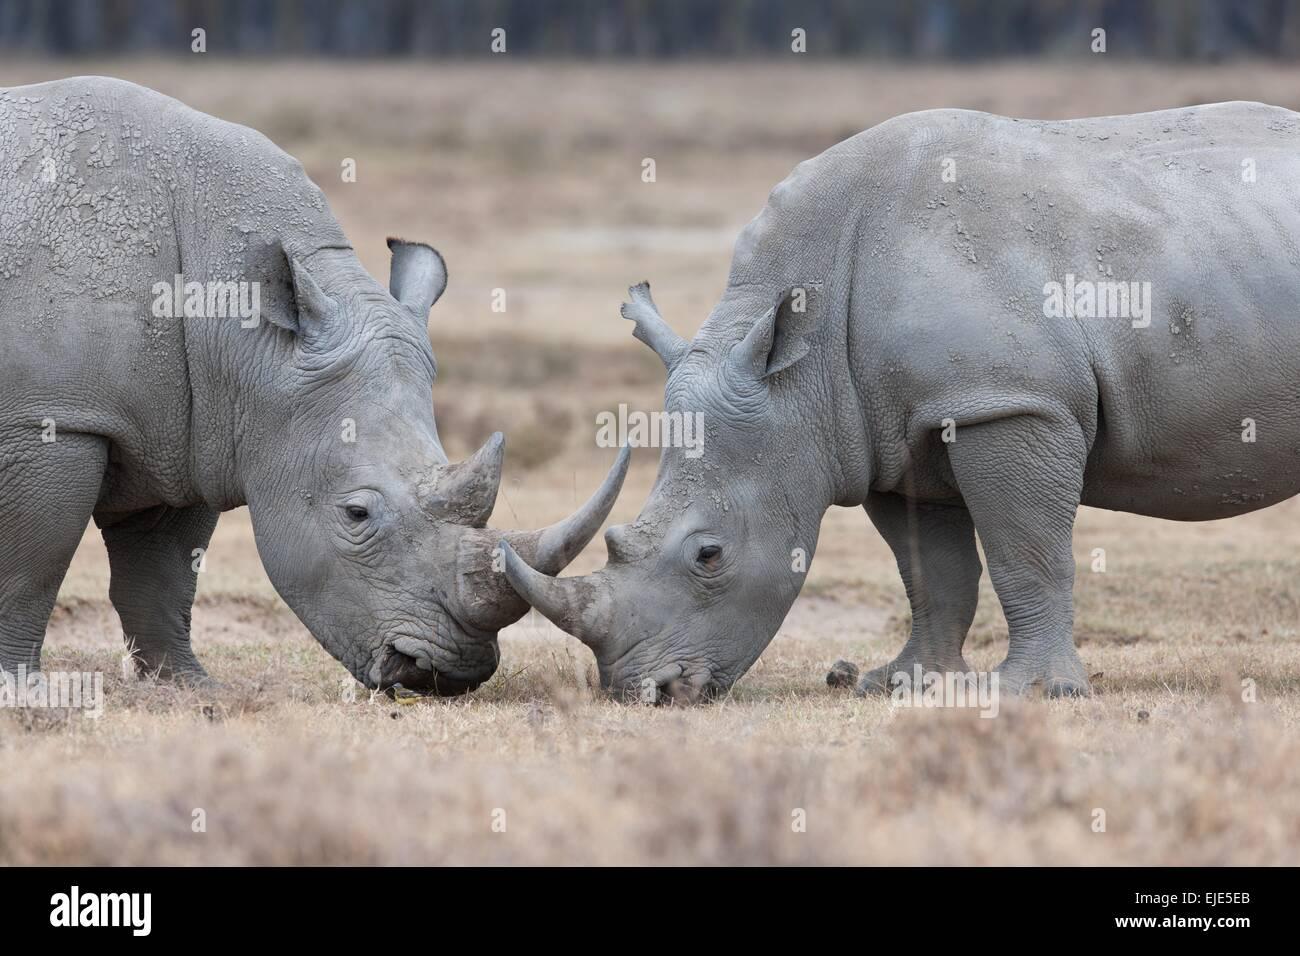 Rhino nel parco nazionale di Lake Nakuru in Kenya Immagini Stock